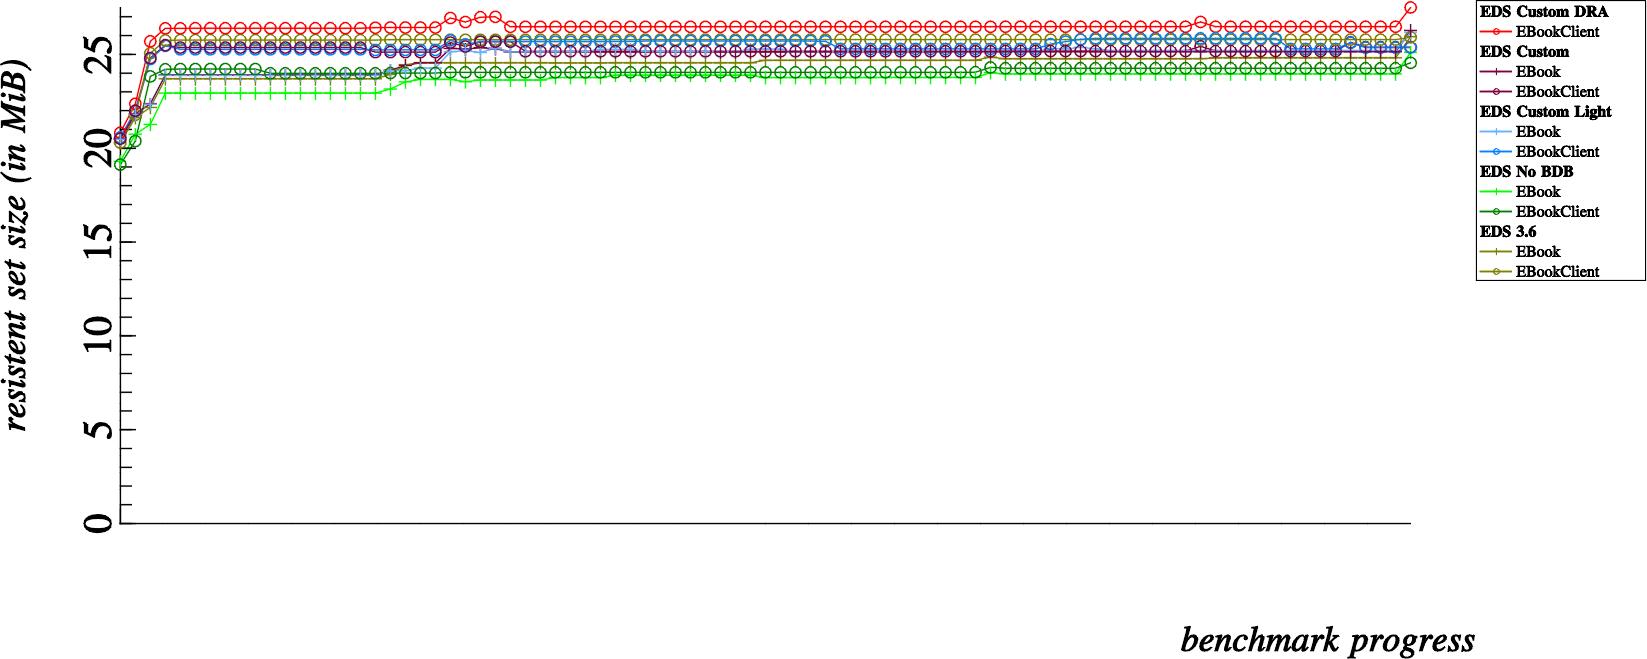 memory-usage-rss-00400